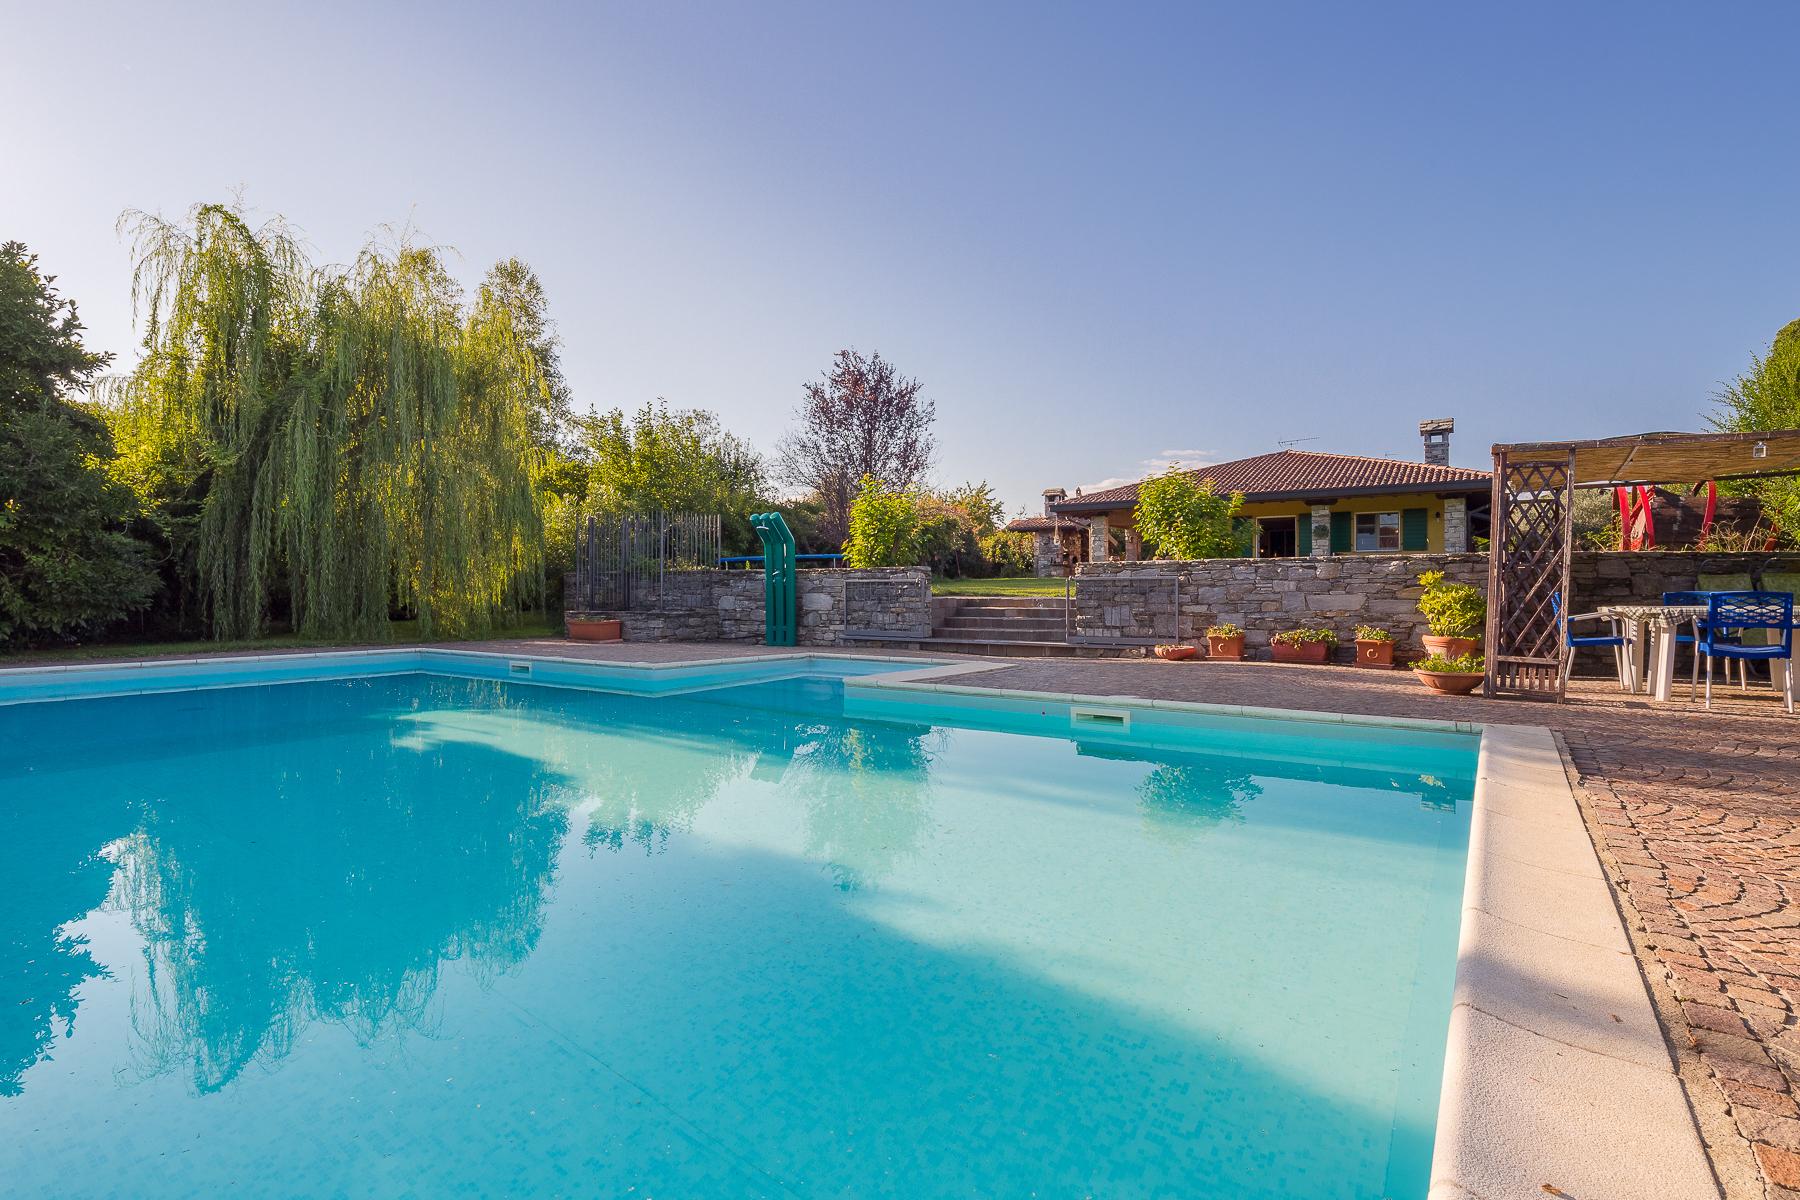 Villa in Vendita a Veruno: 5 locali, 300 mq